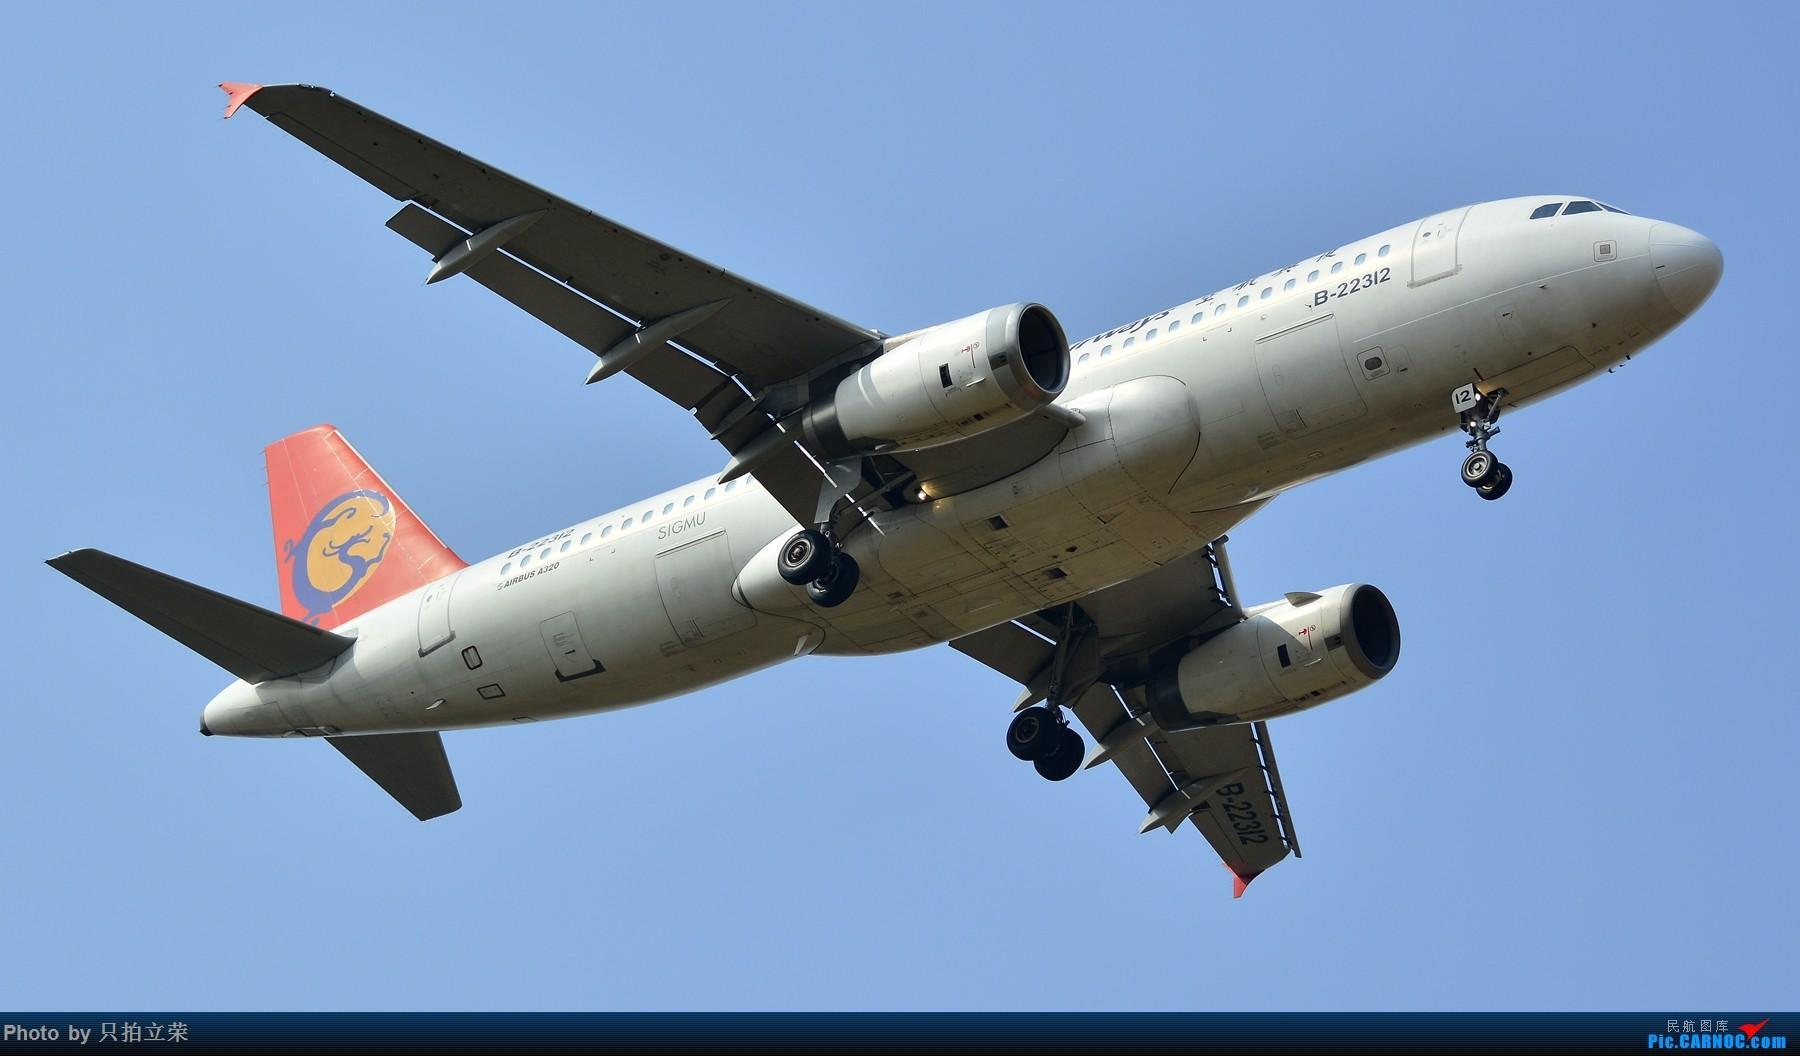 Re:[原创]湖南飞友会之10月9日长沙黄花好货满天飞! AIRBUS A320-200 B-22312 中国长沙黄花国际机场